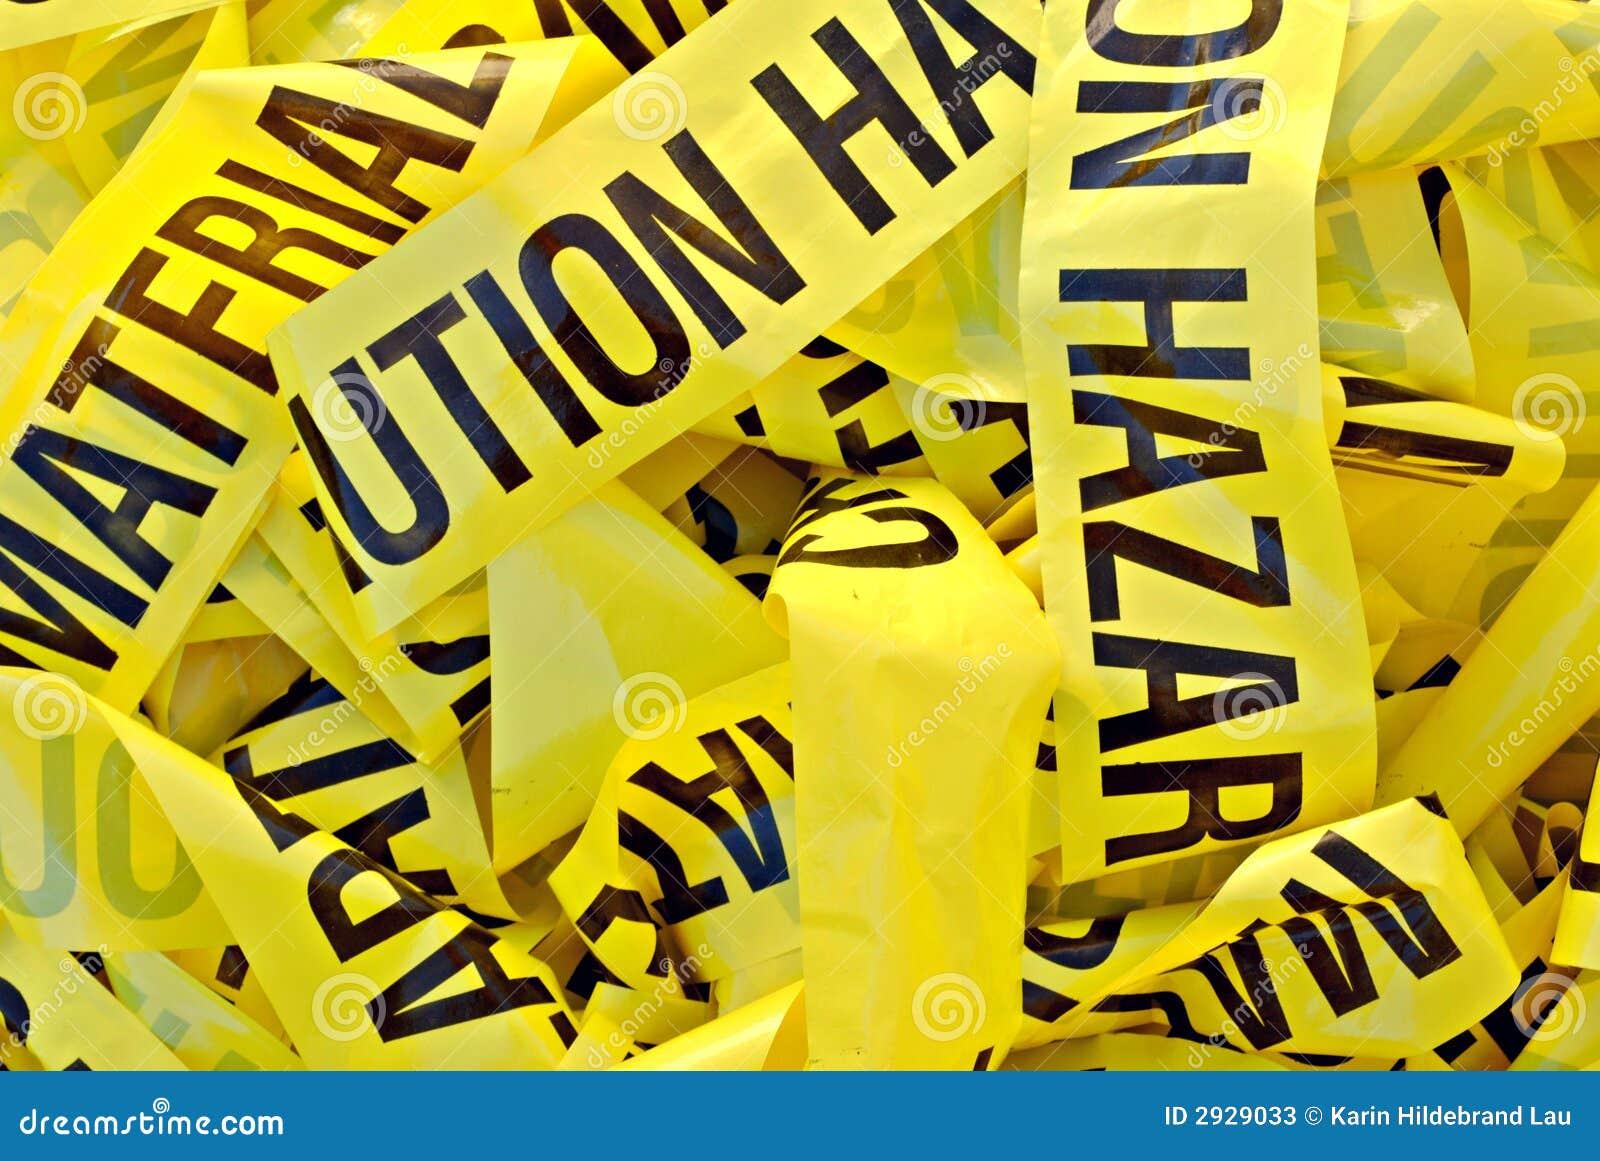 Hazardous Building Material : Hazardous material tape stock photos image